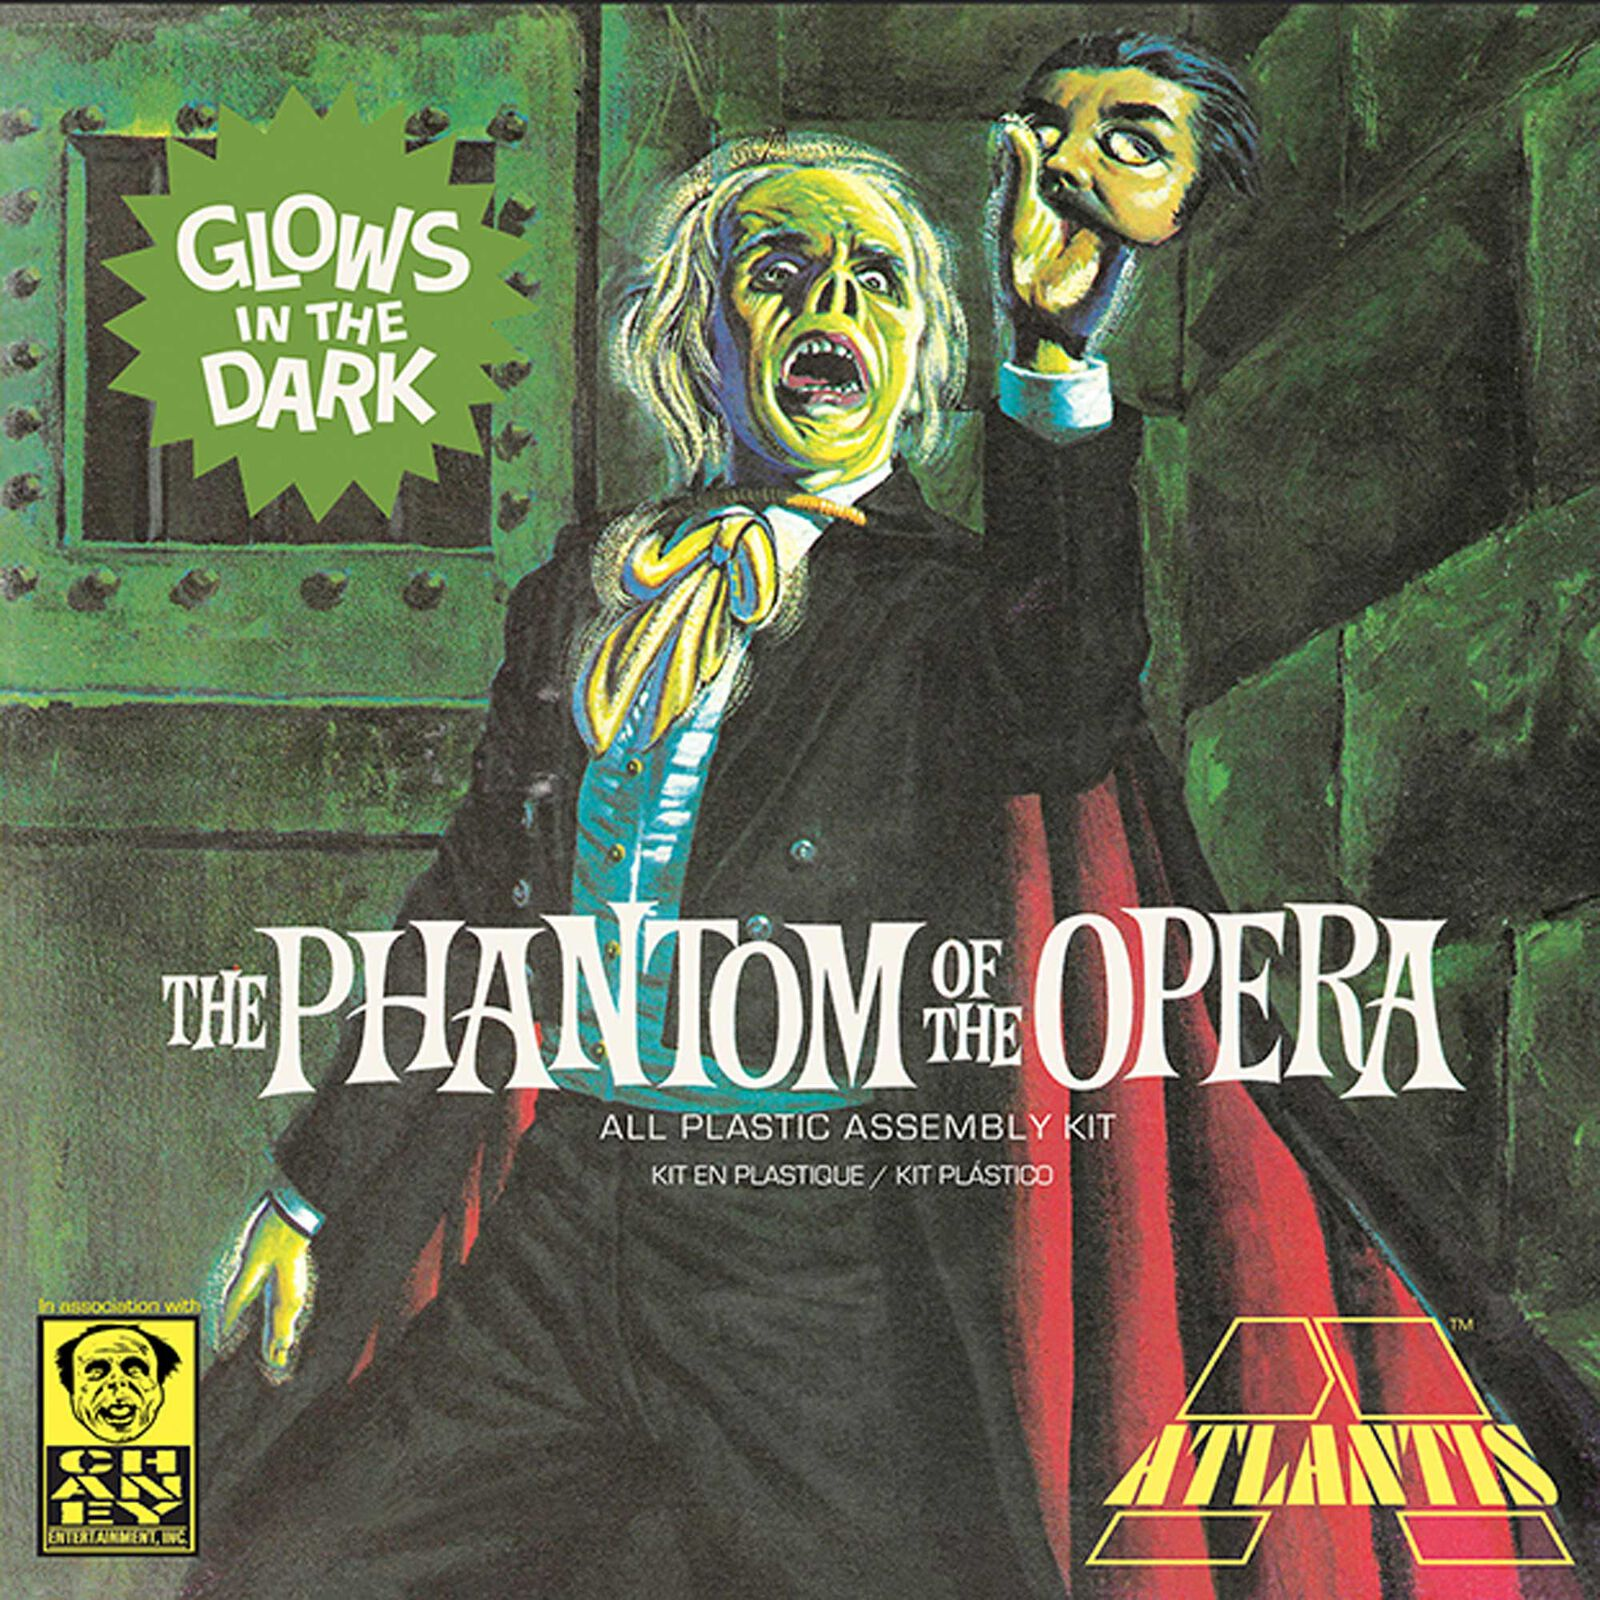 Lon Chaney Phantom of The Opera, Glow Edition